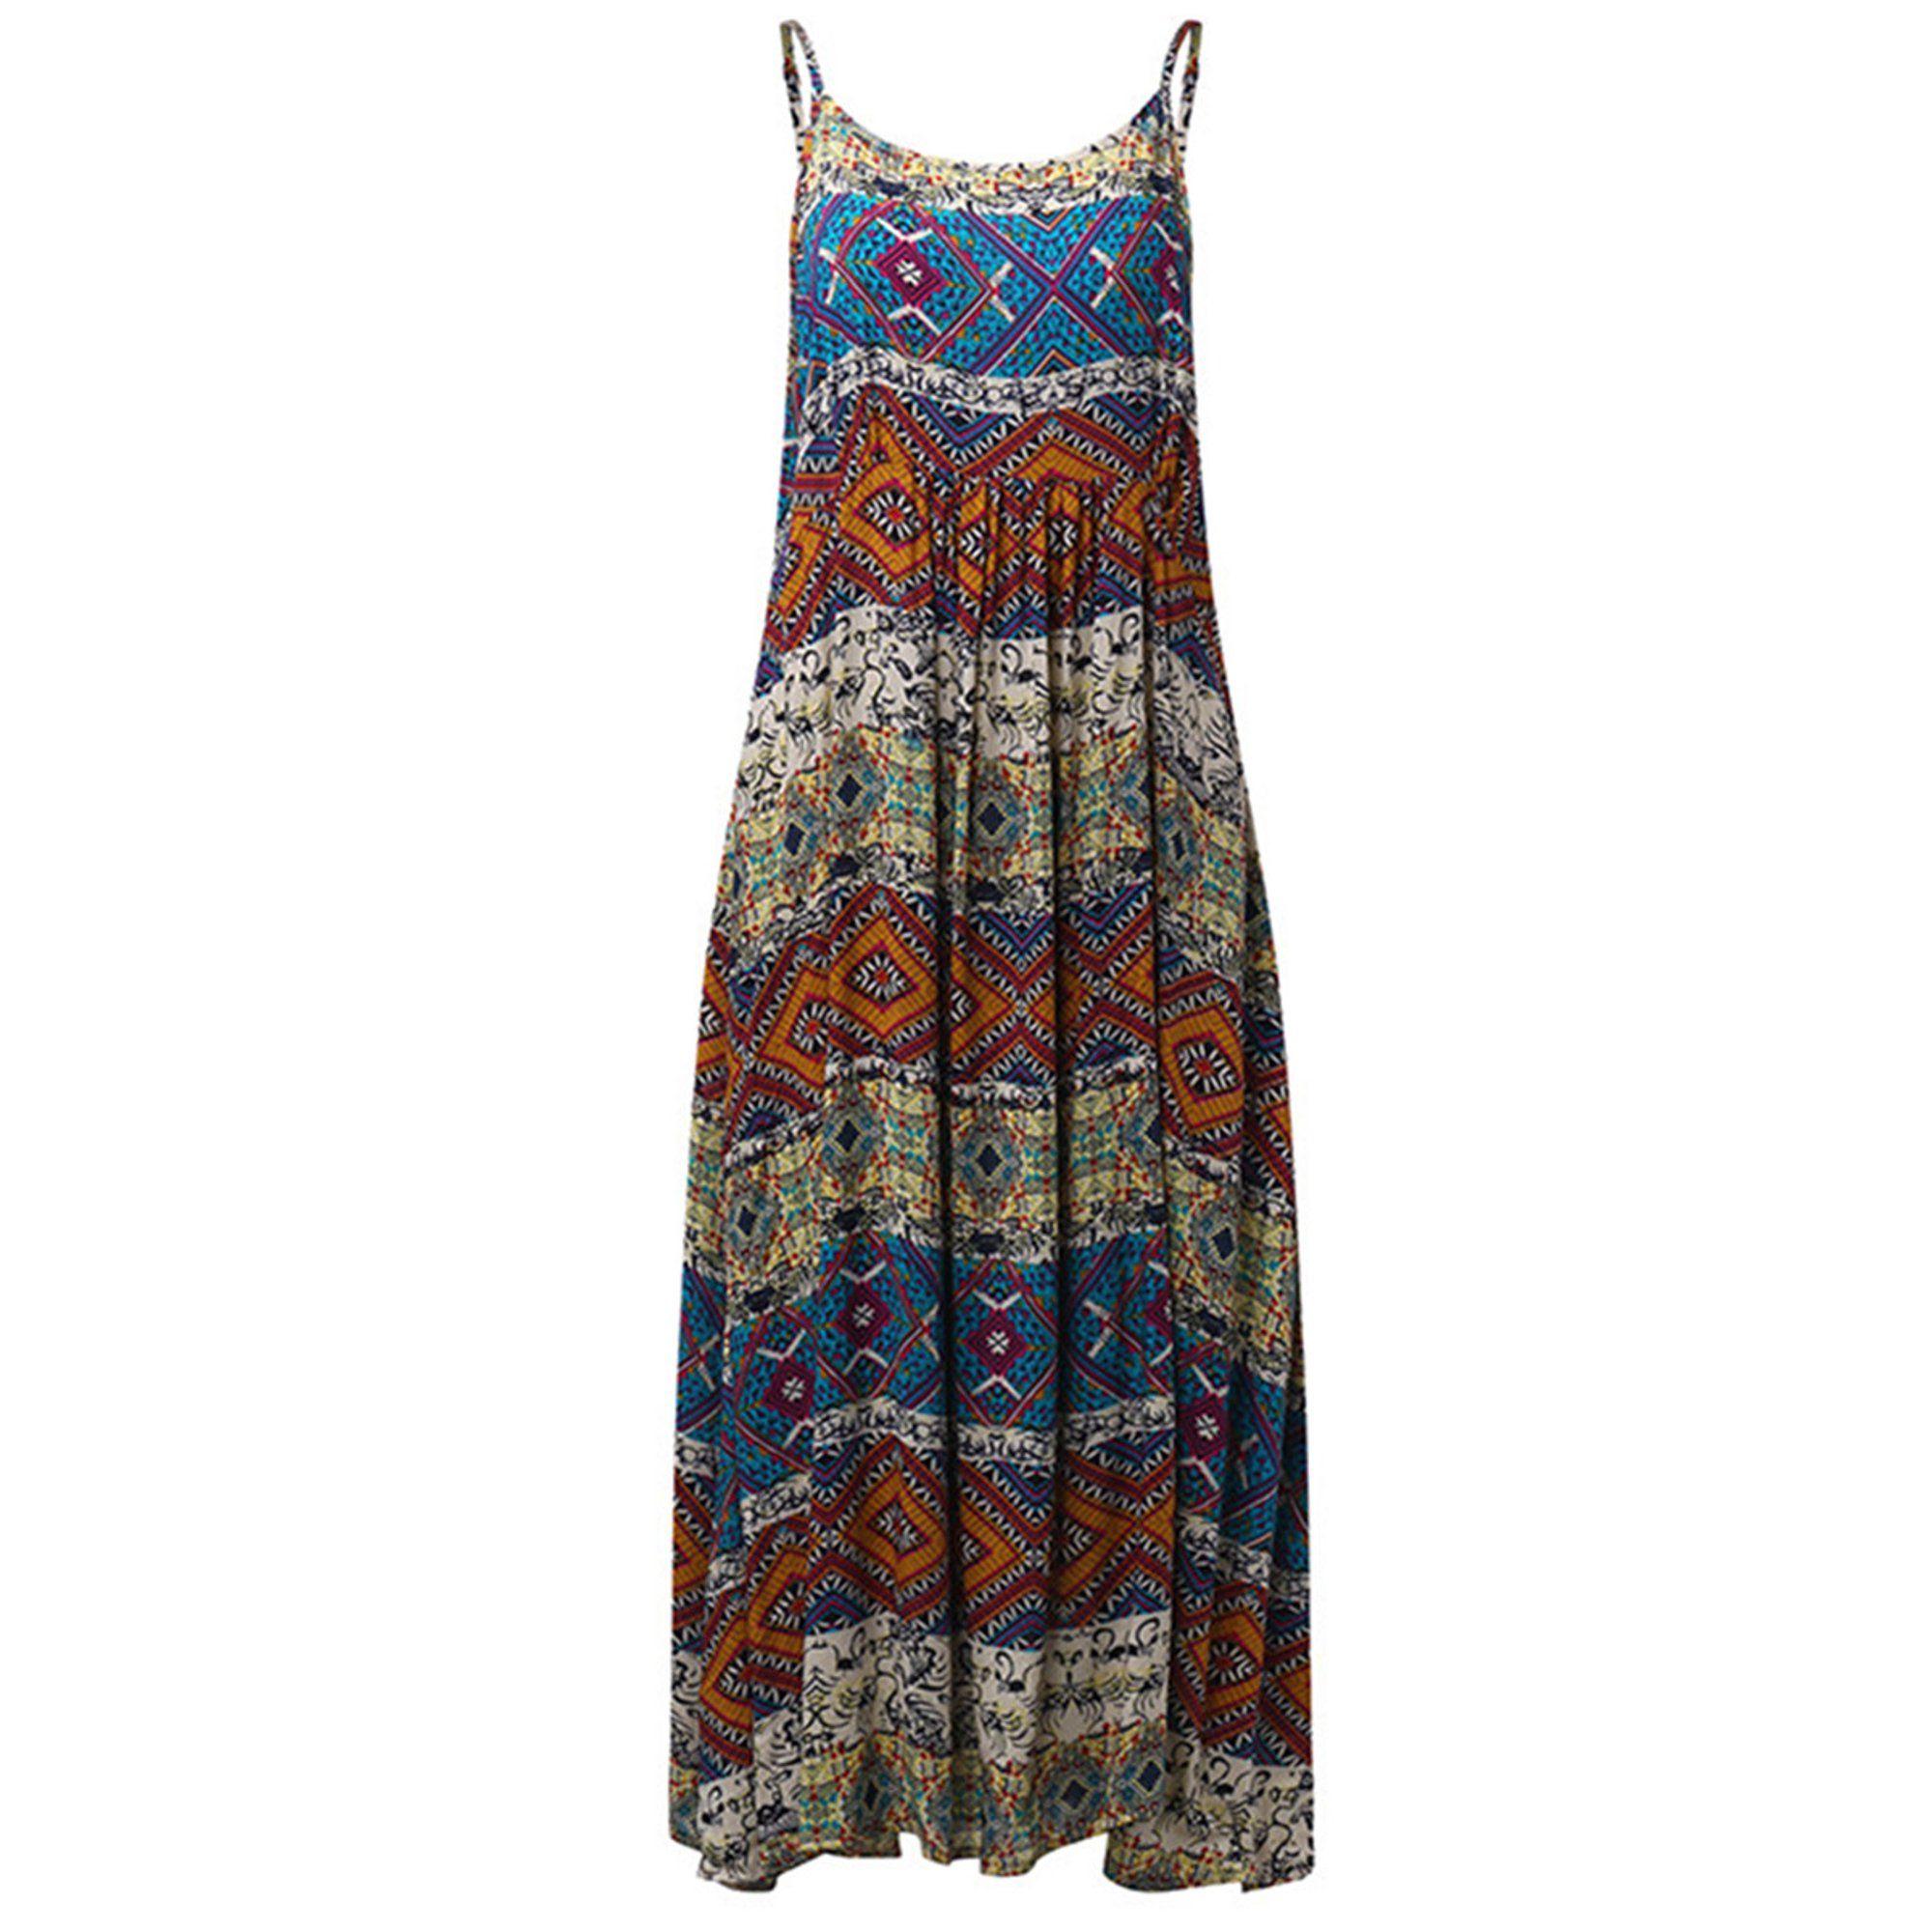 Zanzea Women Bohemia Print Sleeveless Casual Loose Beach Long Maxi Dress Walmart Com Walmart Com In 2021 Vintage Maxi Dress Maxi Dress Boho Maxi Dress [ 2000 x 2000 Pixel ]